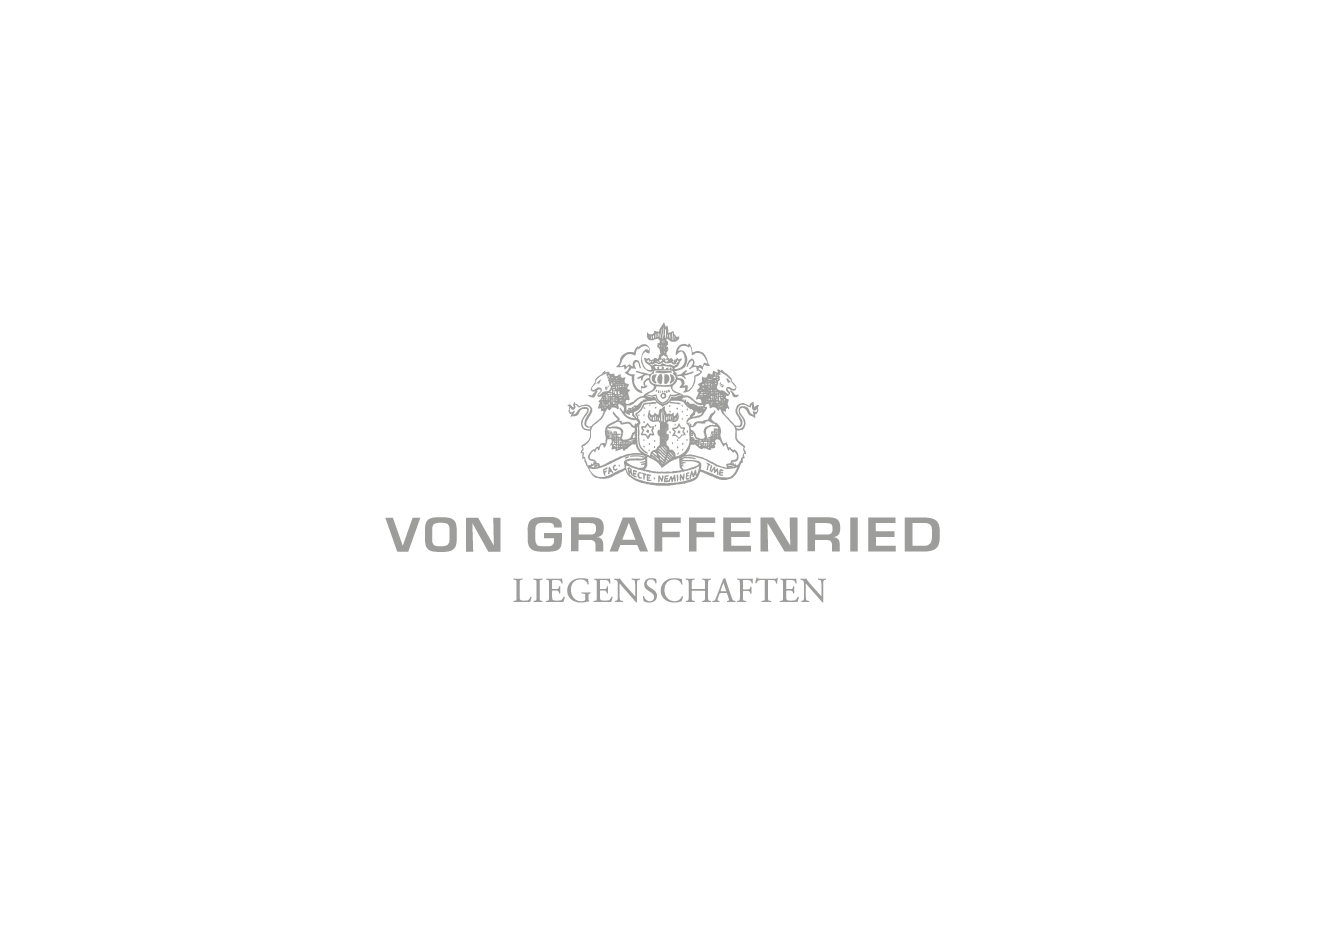 vongraffenried-sw